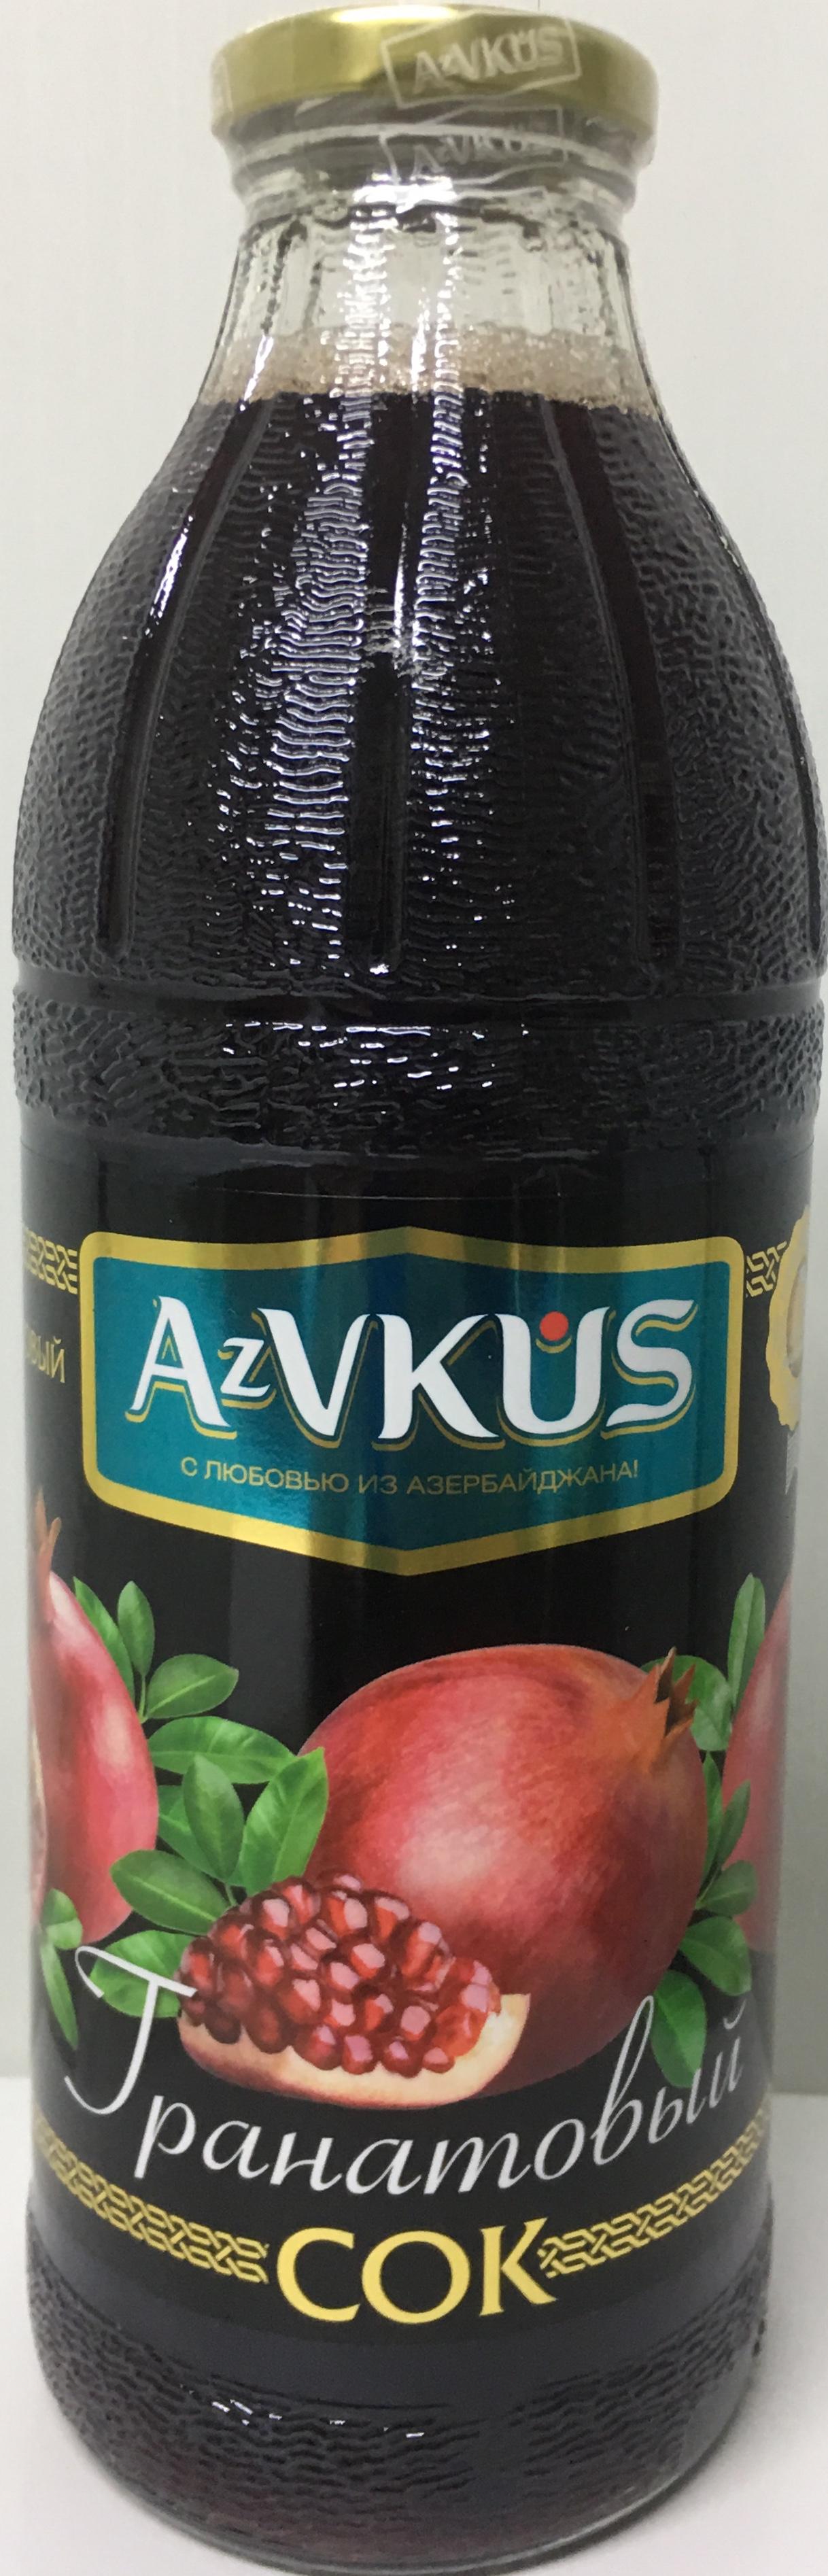 AZVKUS гранатовый сок Premium 1л azvkus из фейхоа 1л